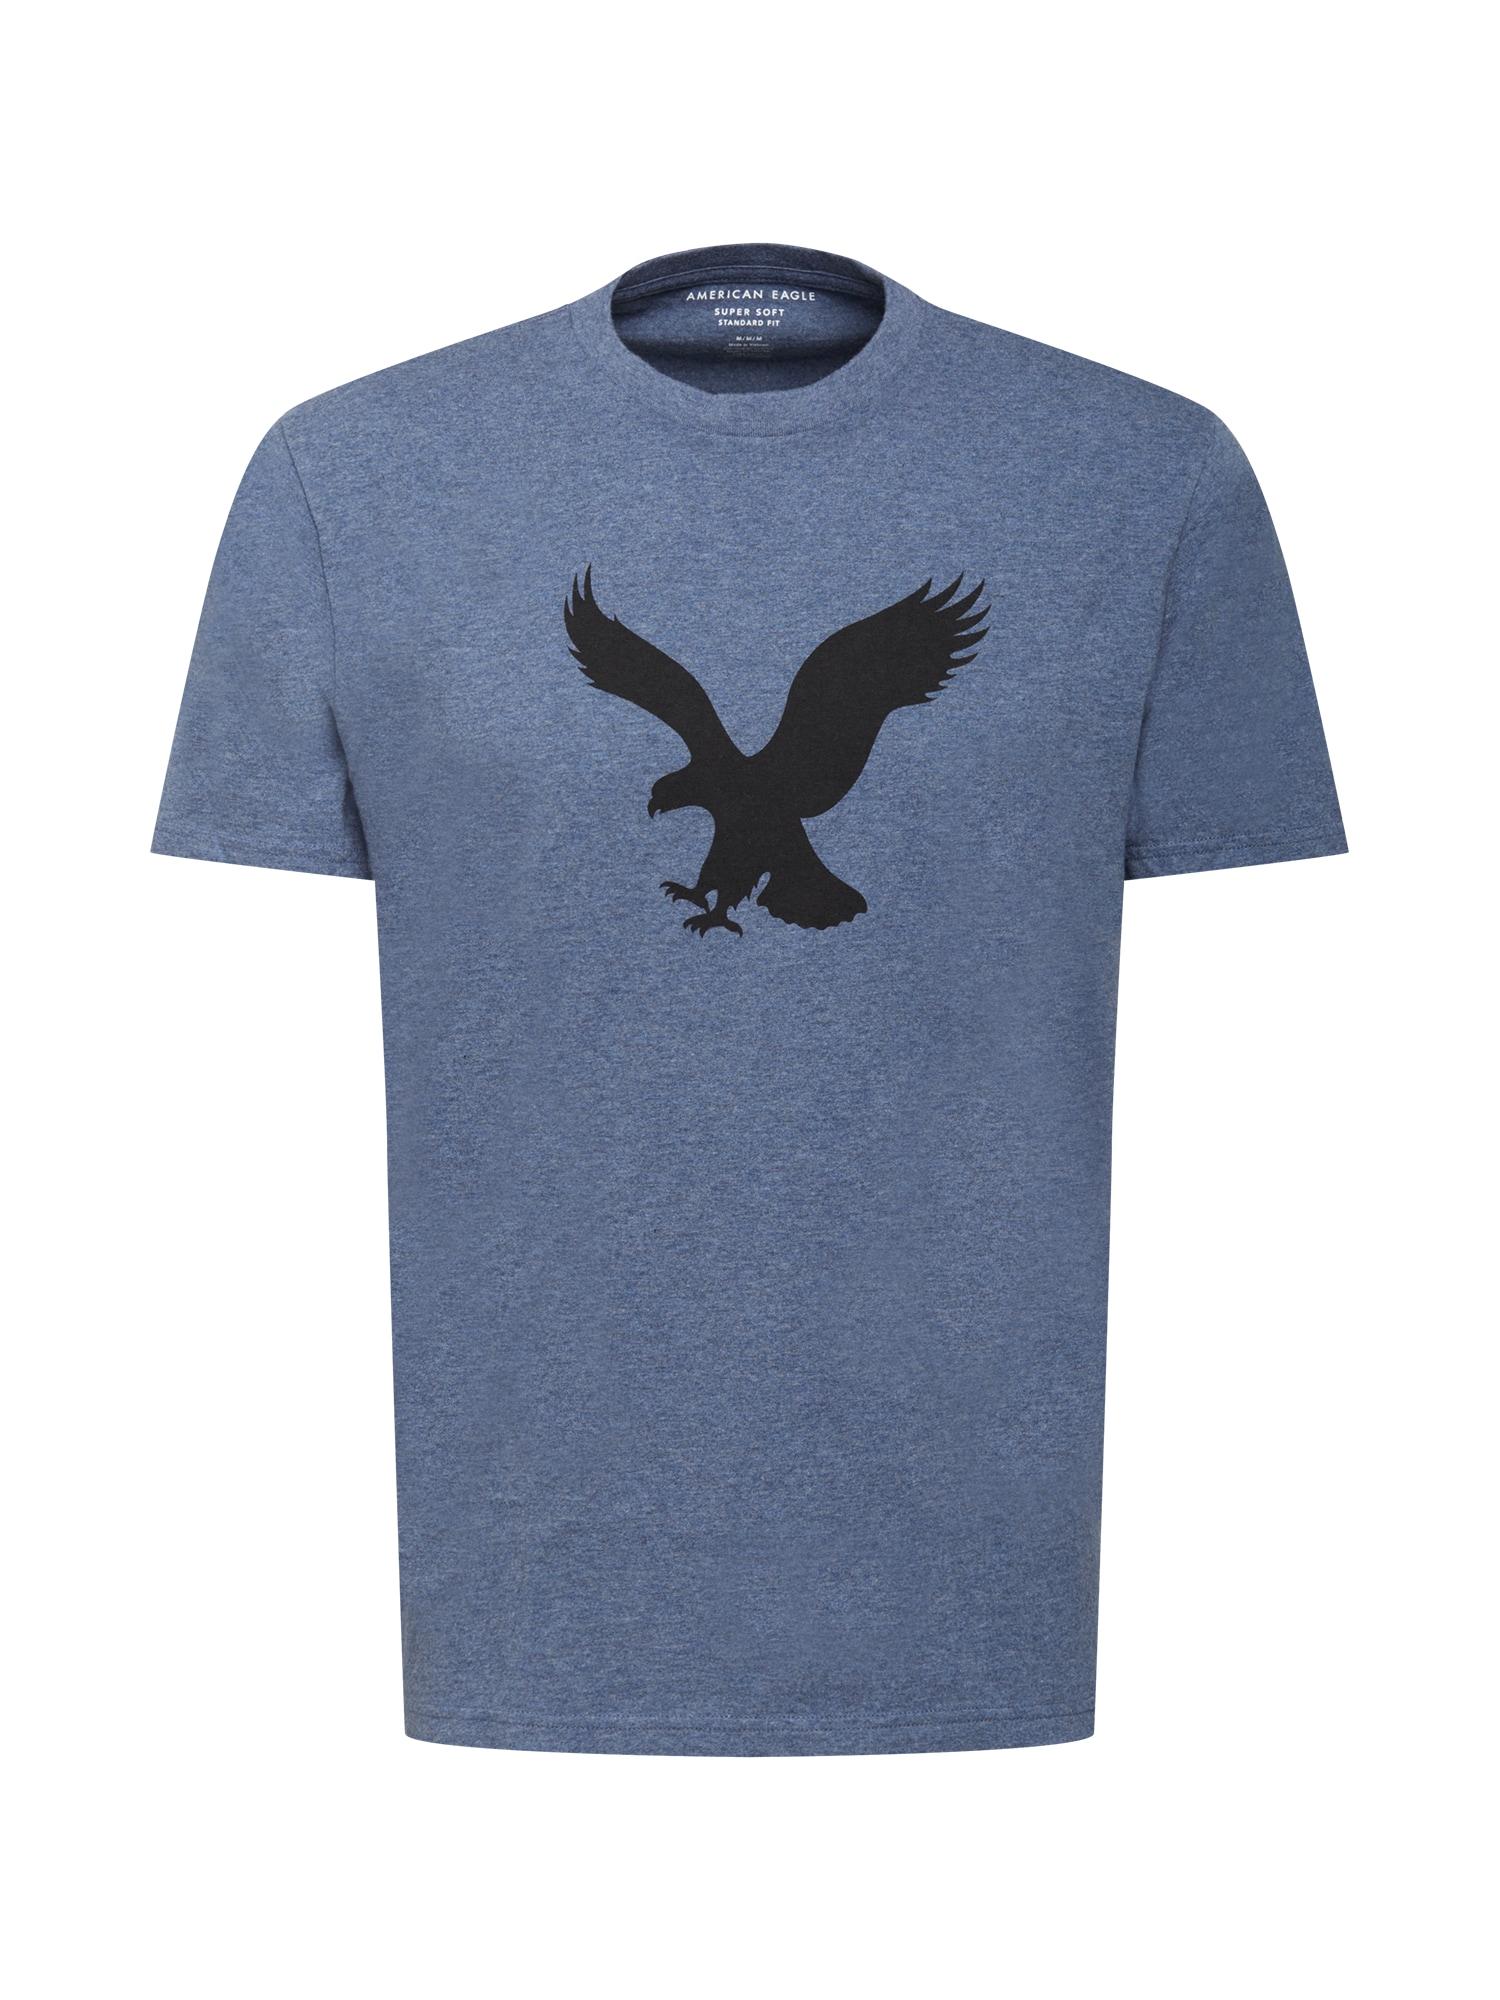 American Eagle Marškinėliai margai mėlyna / juoda